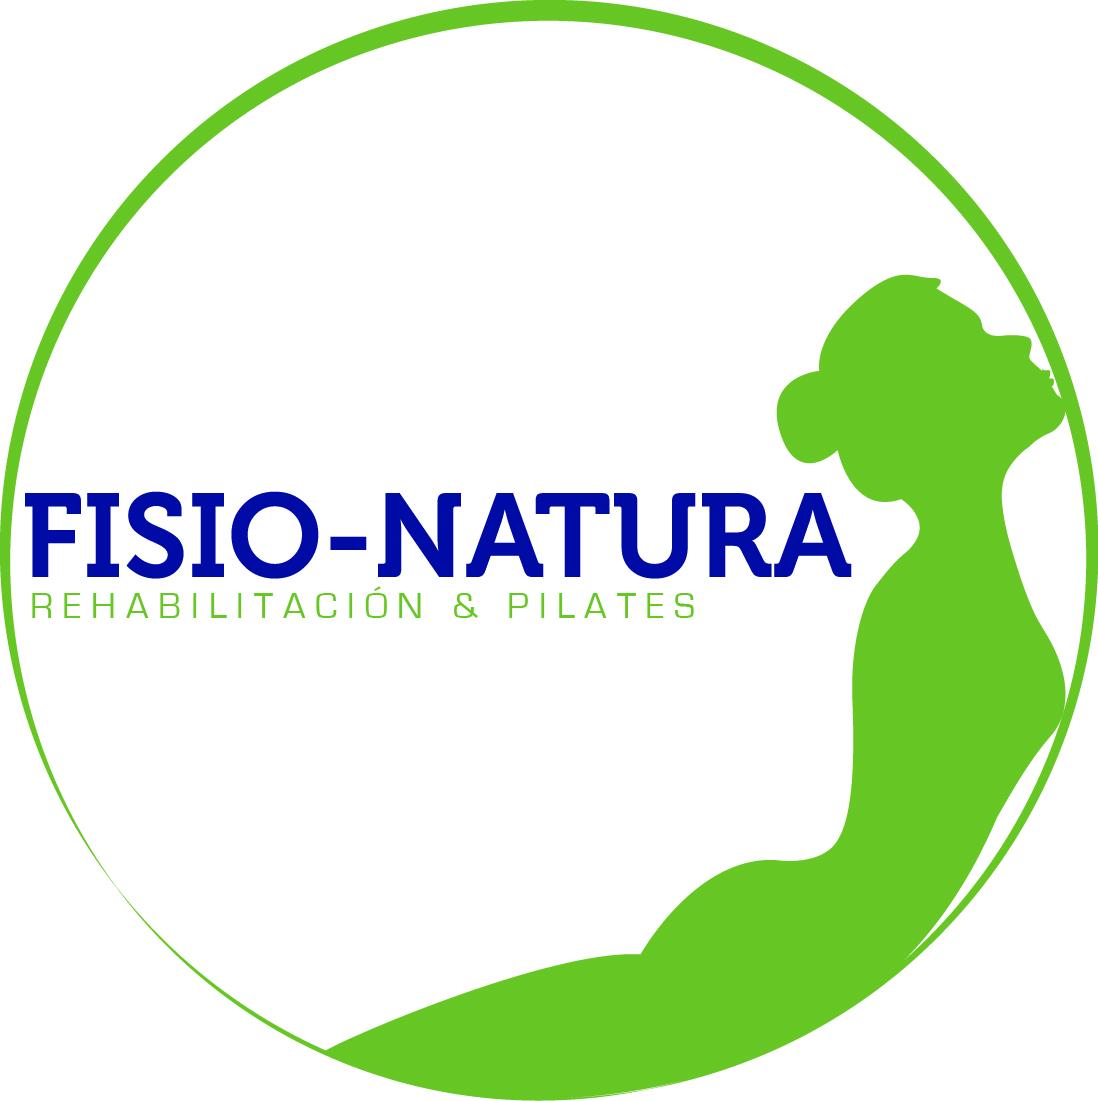 Fisio - Natura